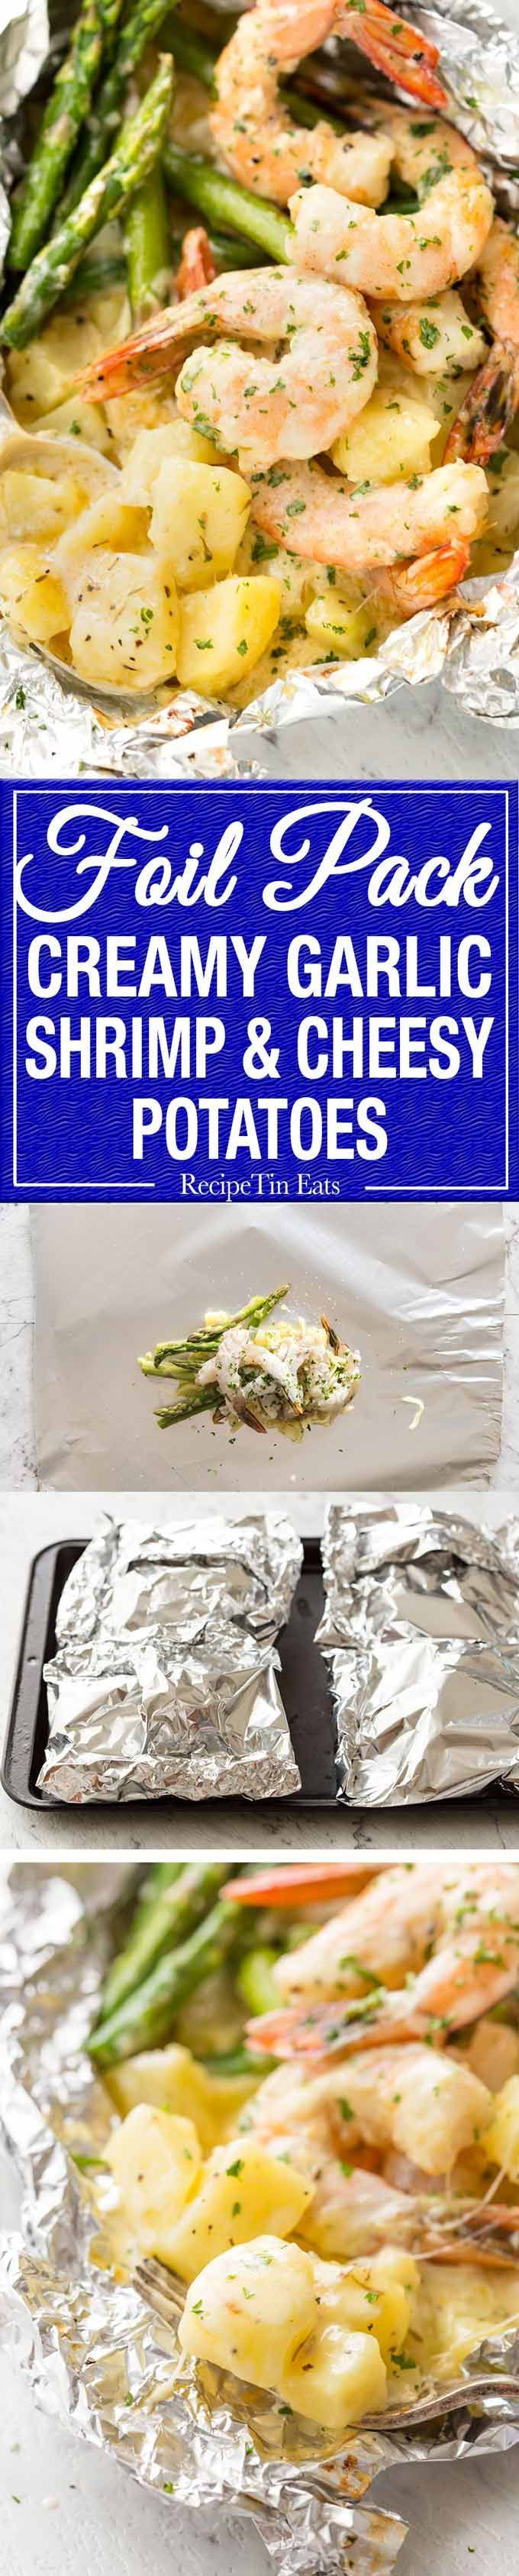 Photo of Creamy Garlic Shrimp, Cheesy Potatoes and asparagus – seriou…